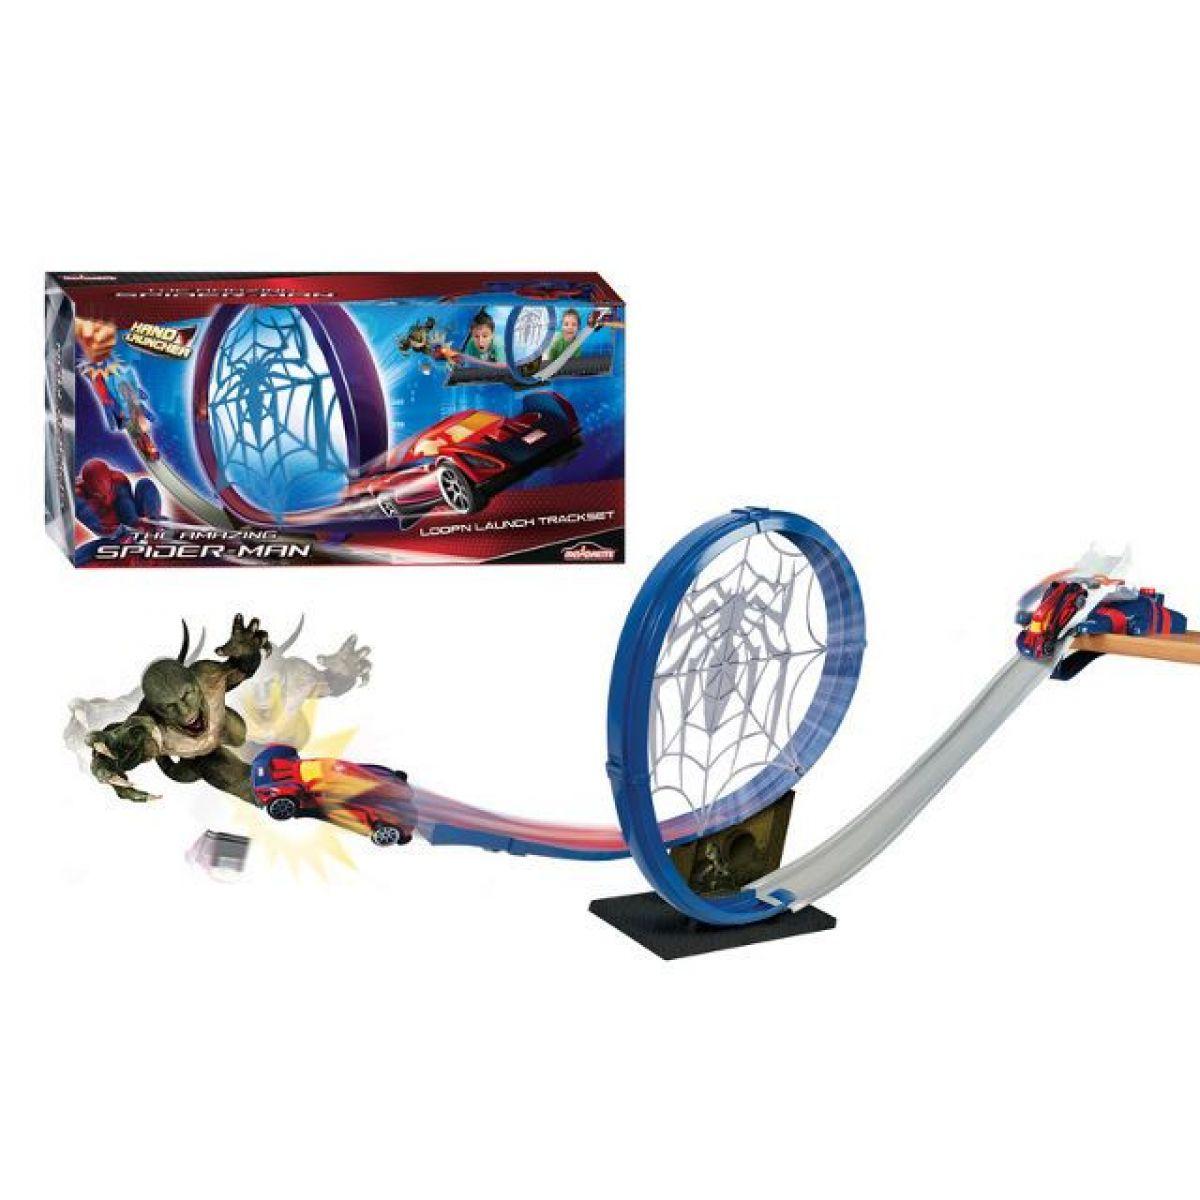 Majorette Spiderman Loop n'Launch dráha s autem